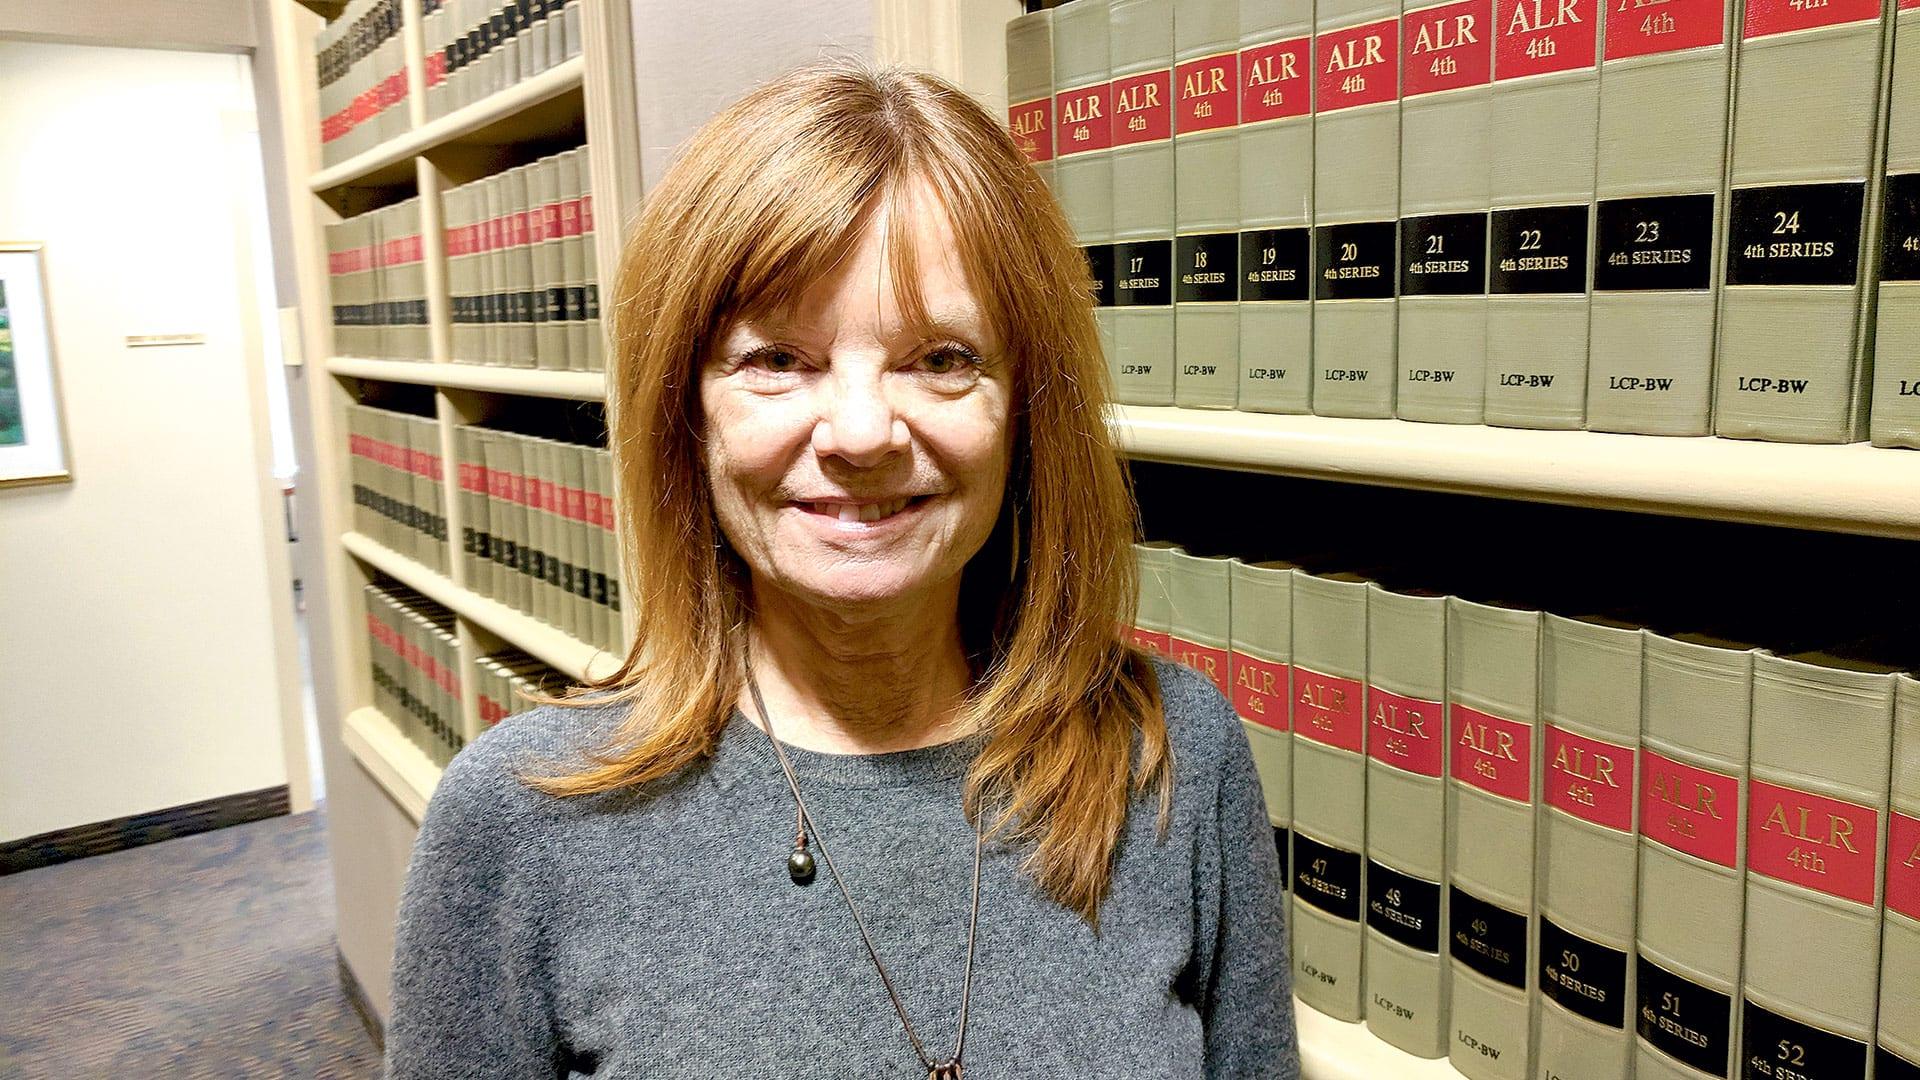 Pat Rapinchuk says some employers might avoid drug testing for marijuana